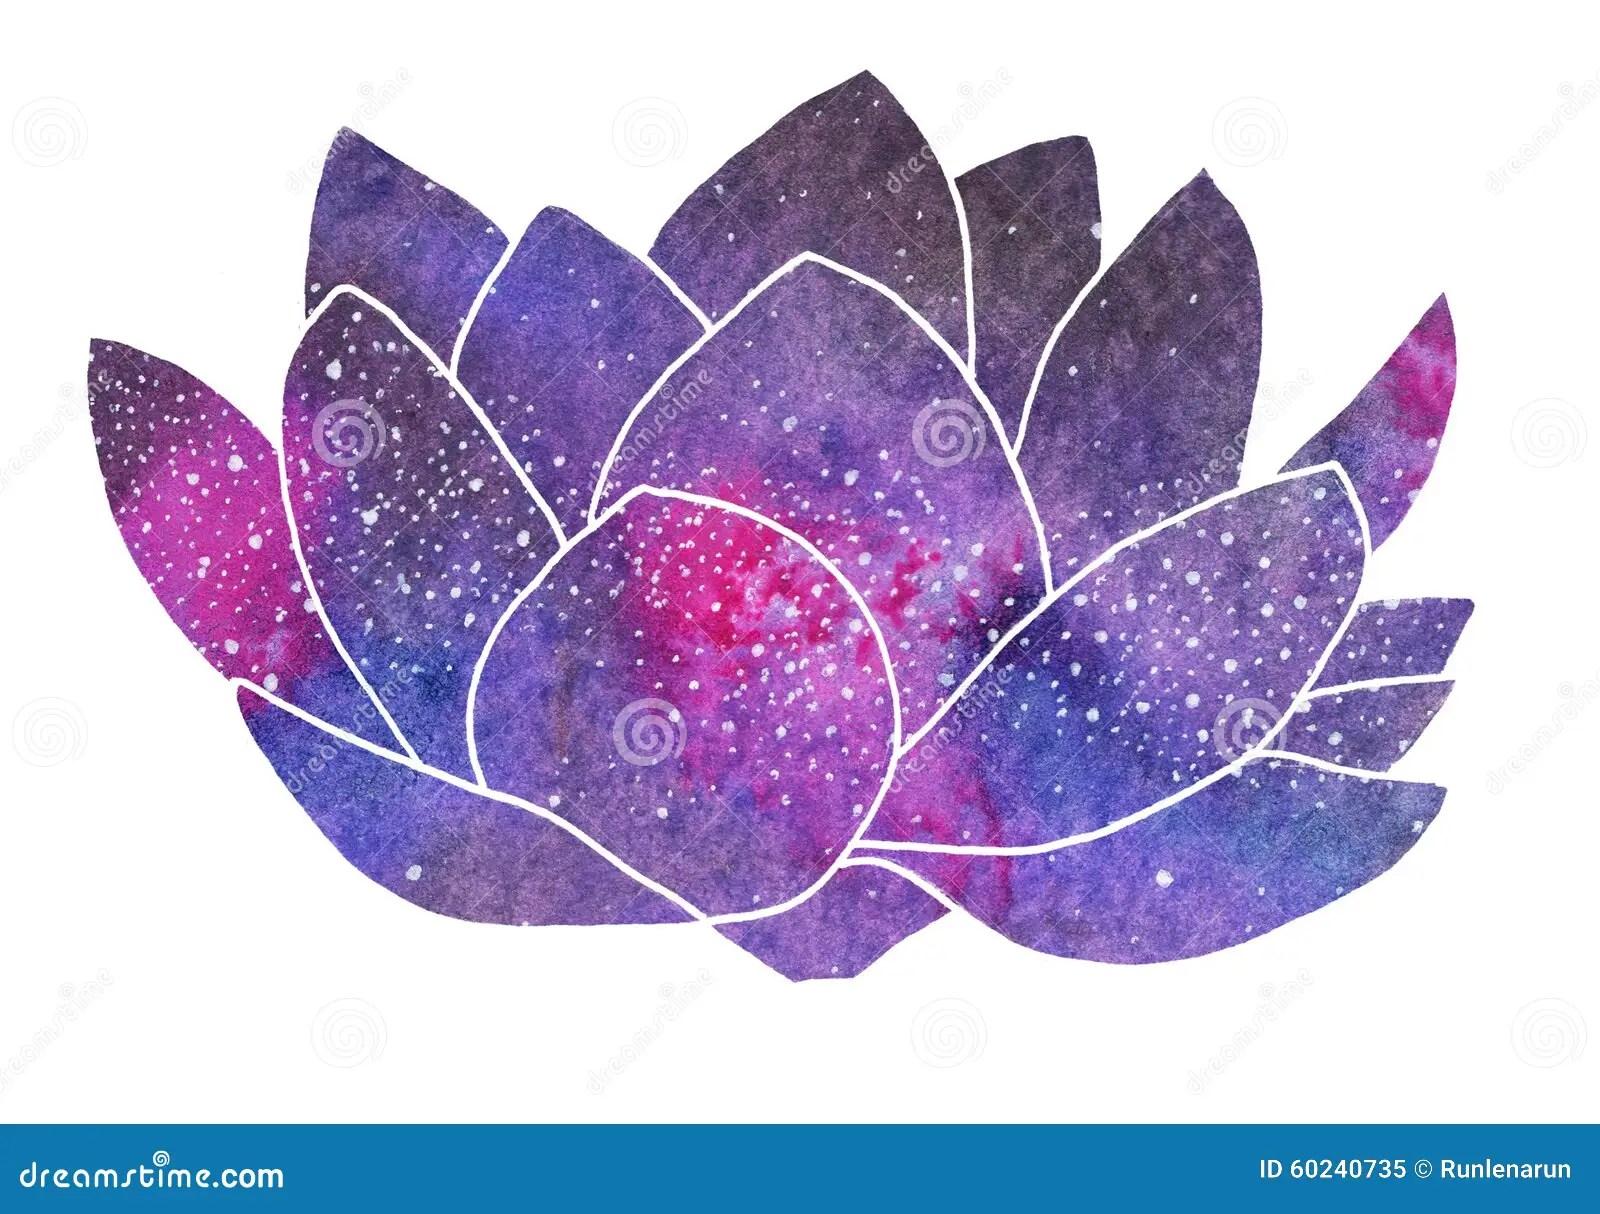 Cute Buddha Wallpaper Galaxy Lotus Hand Drawn Cosmic Flower Stock Image Image